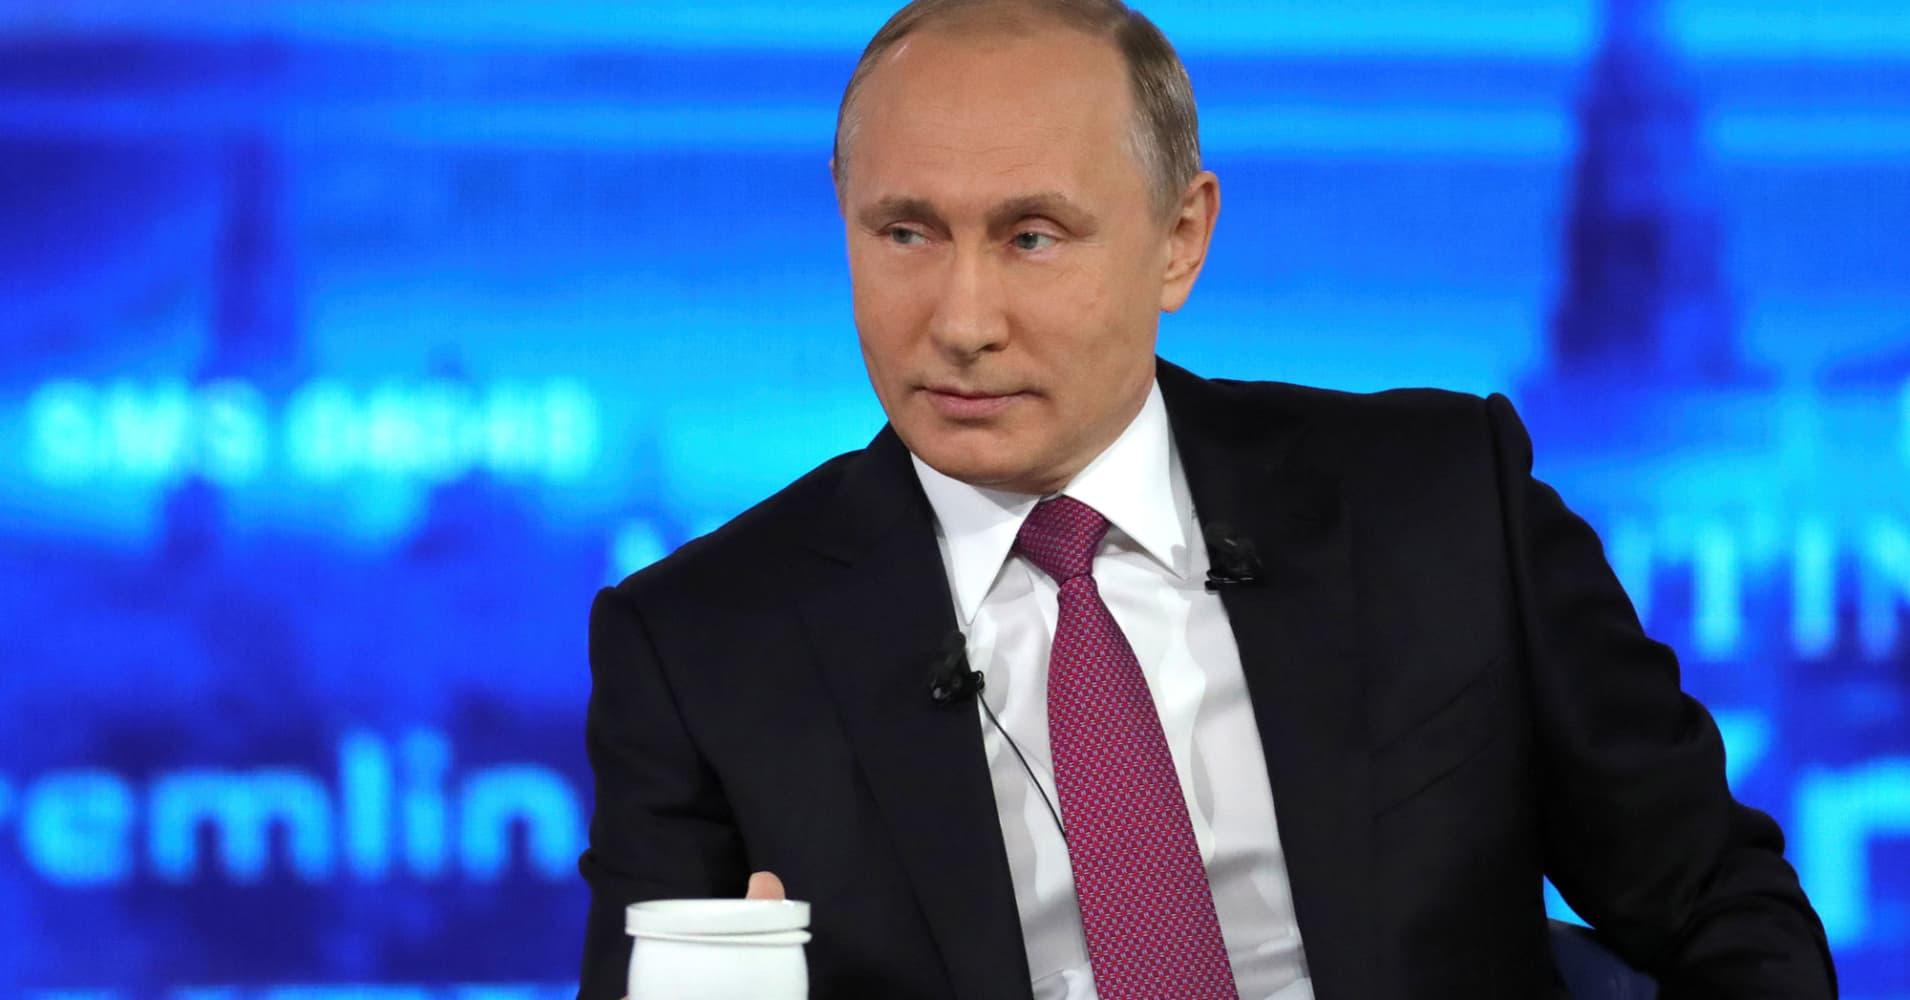 Putin compares former FBI Director Comey to NSA leaker Snowden, offers asylum